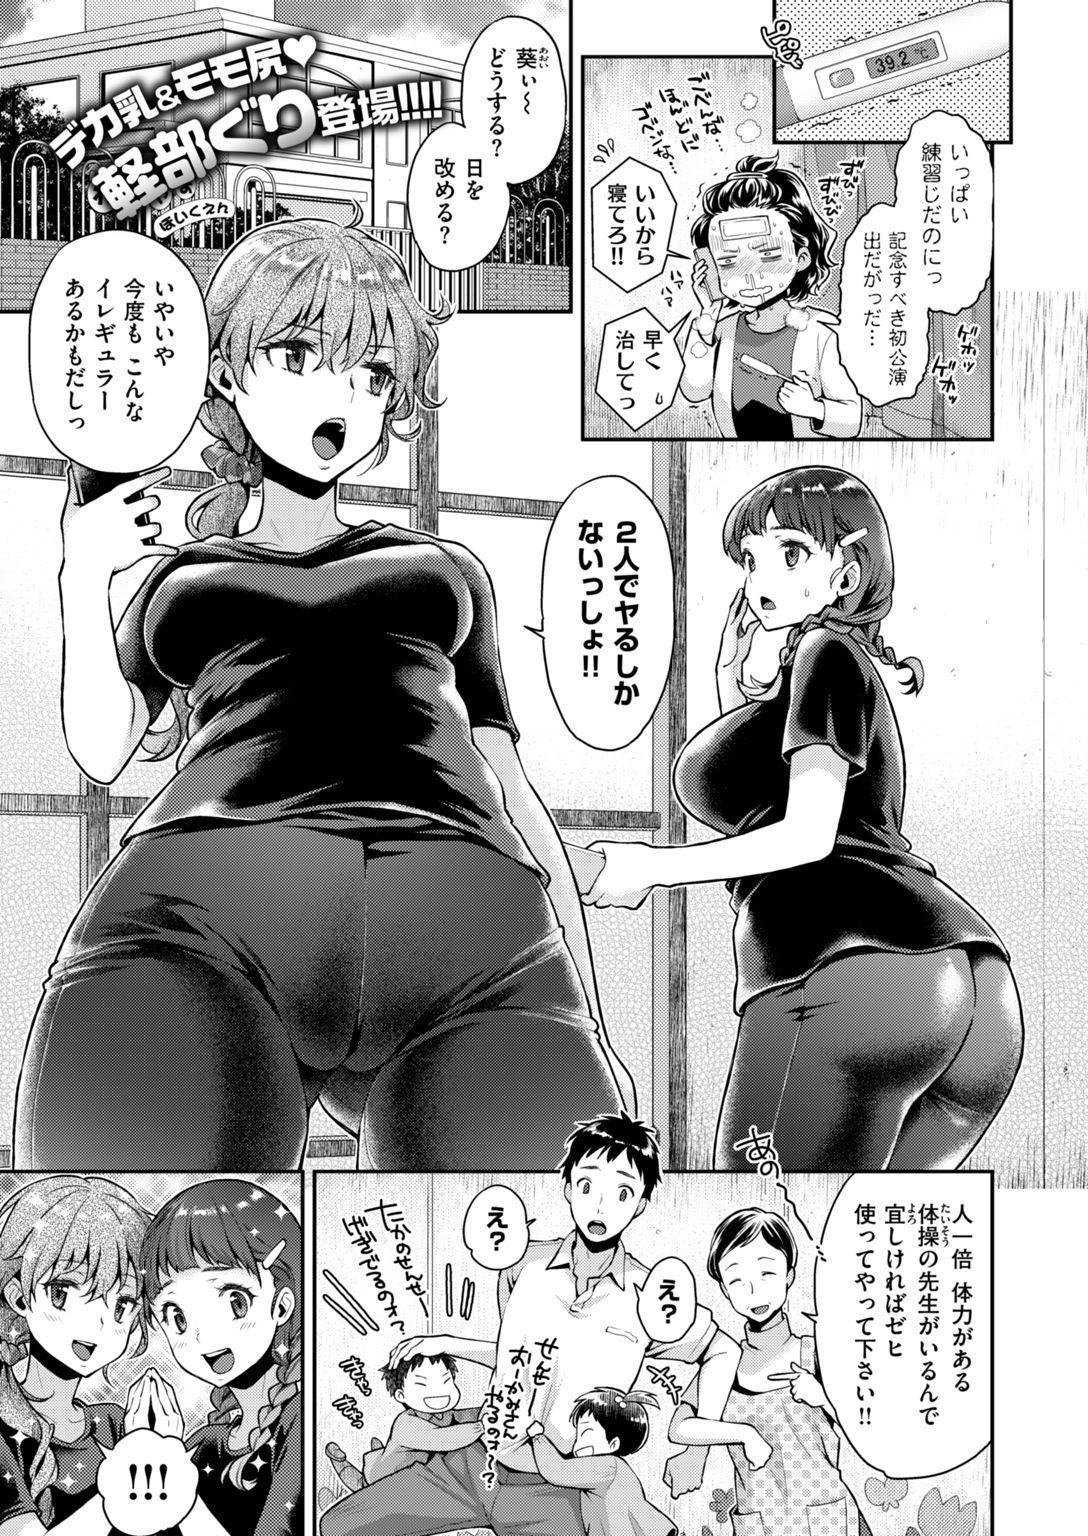 COMIC HAPPINING Vol. 2 47